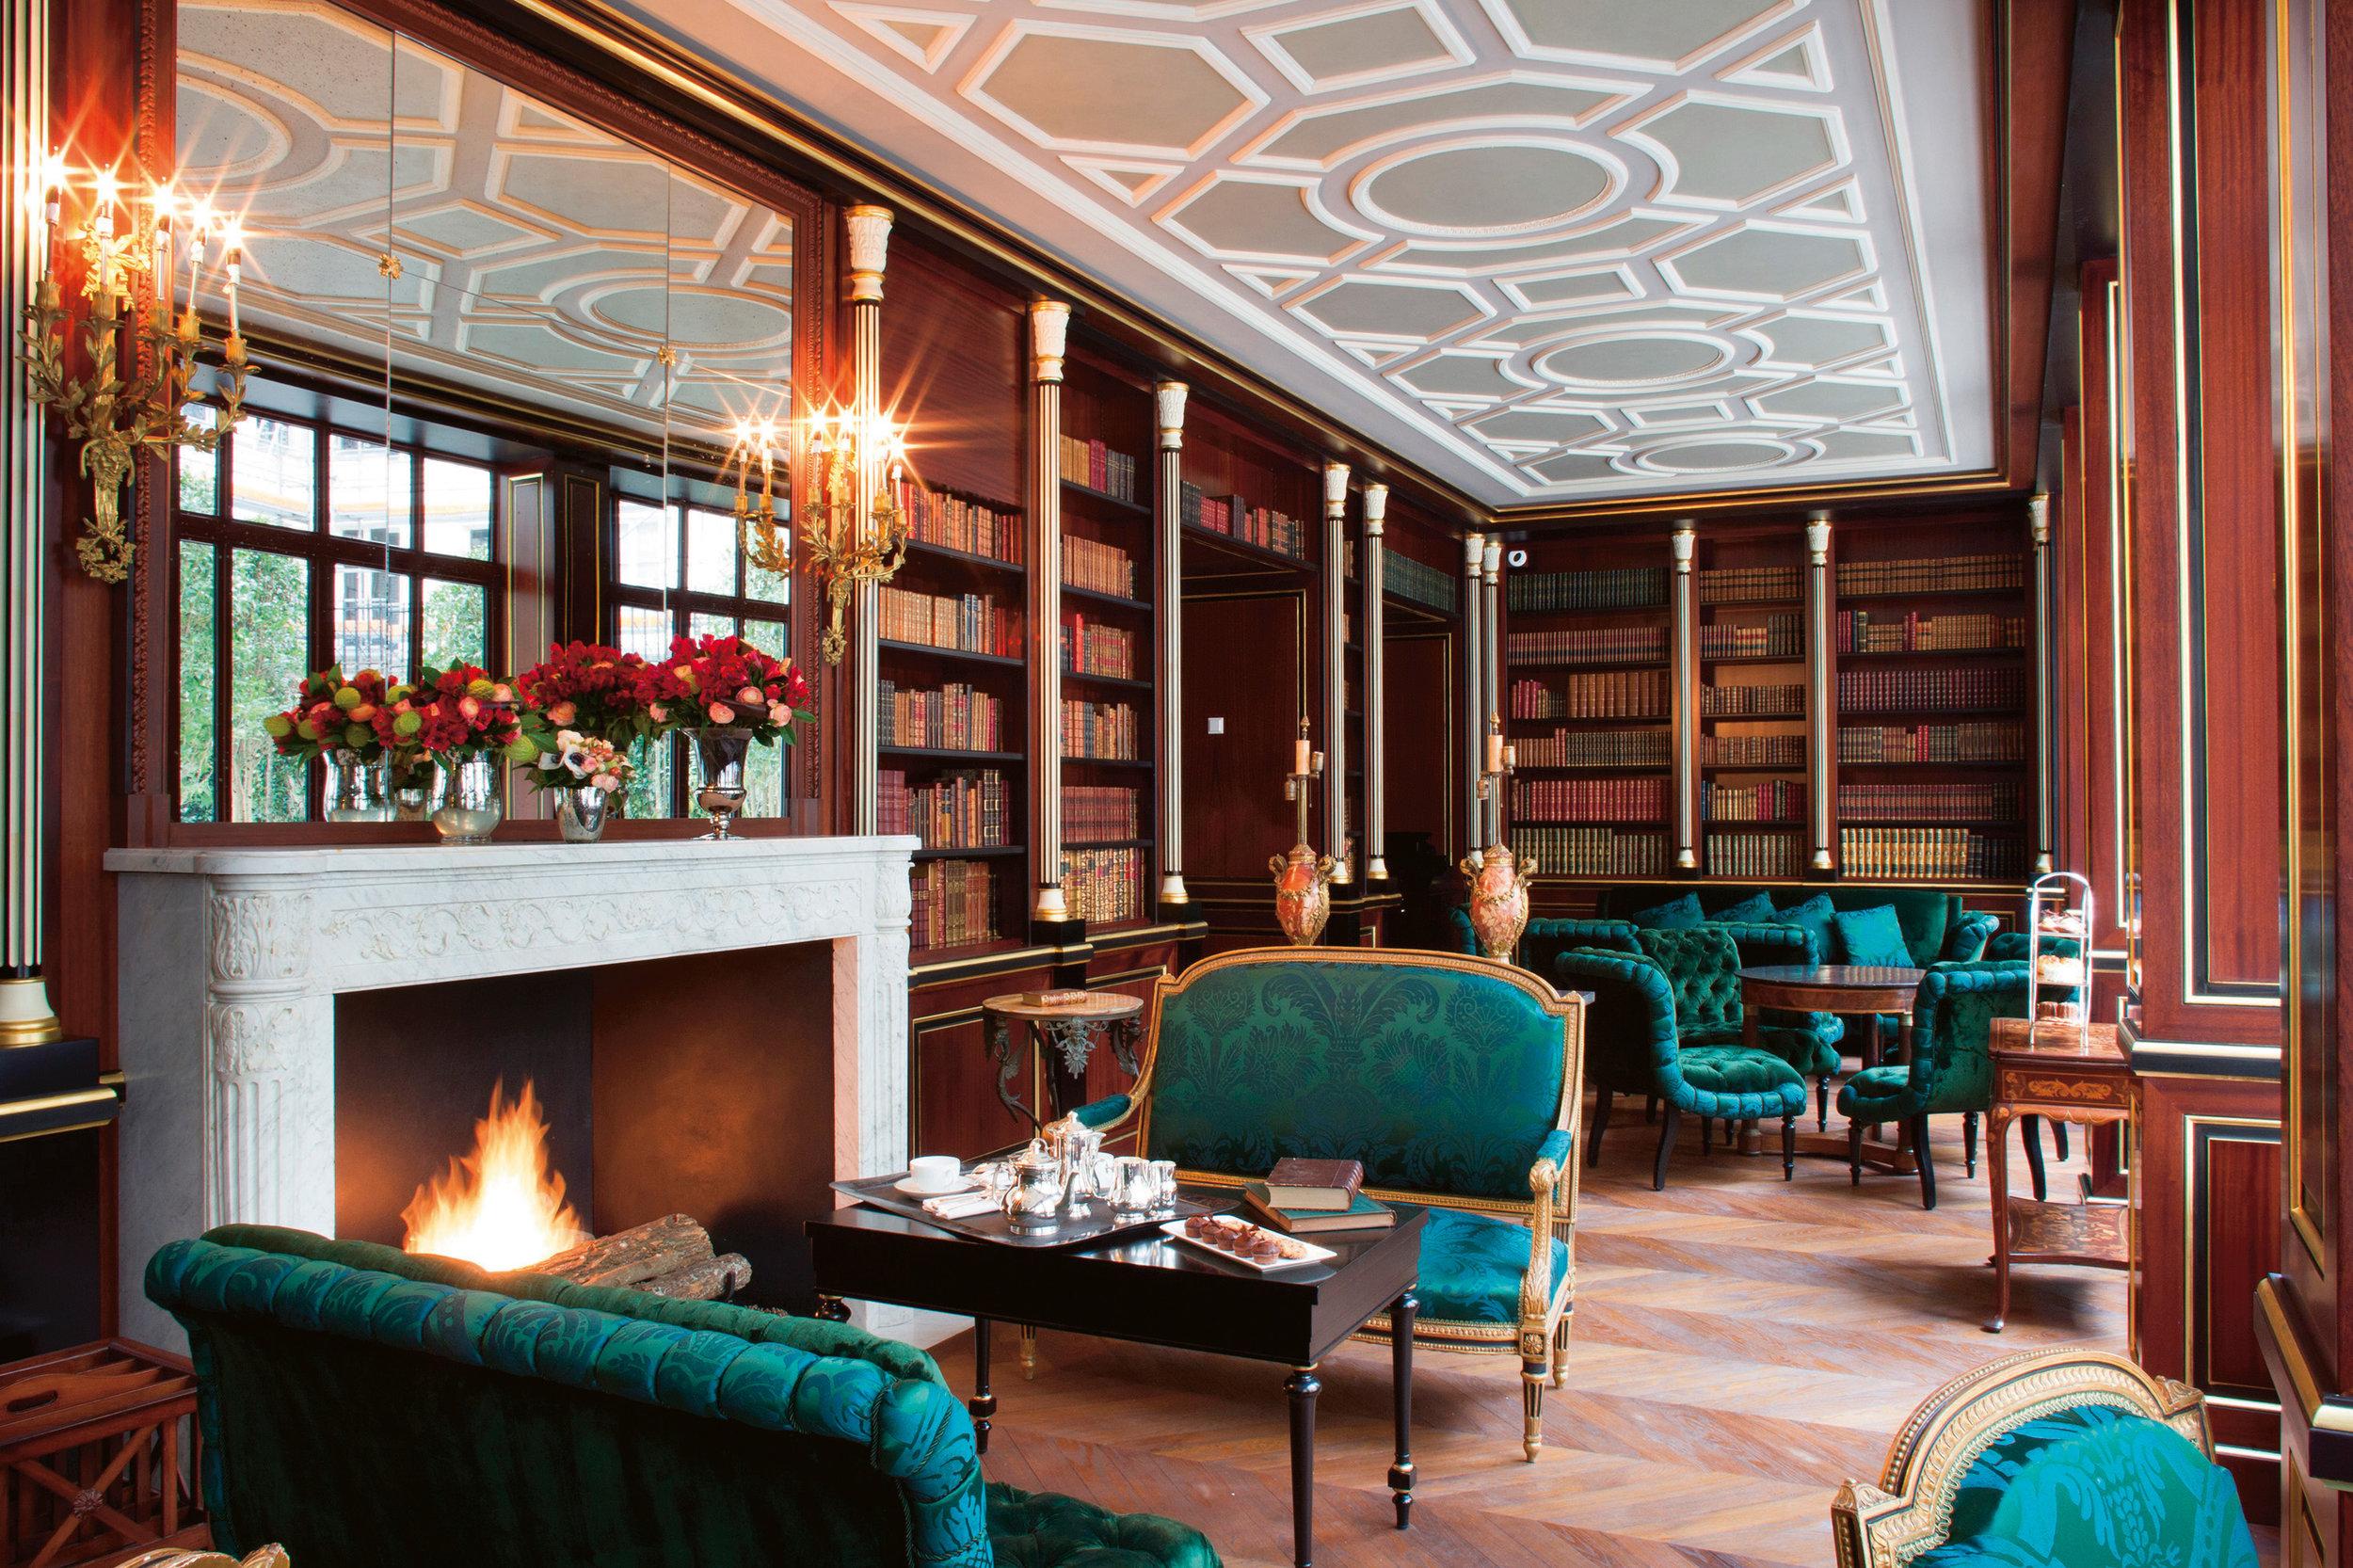 La-Reserve-Paris-Hotel-library.jpg